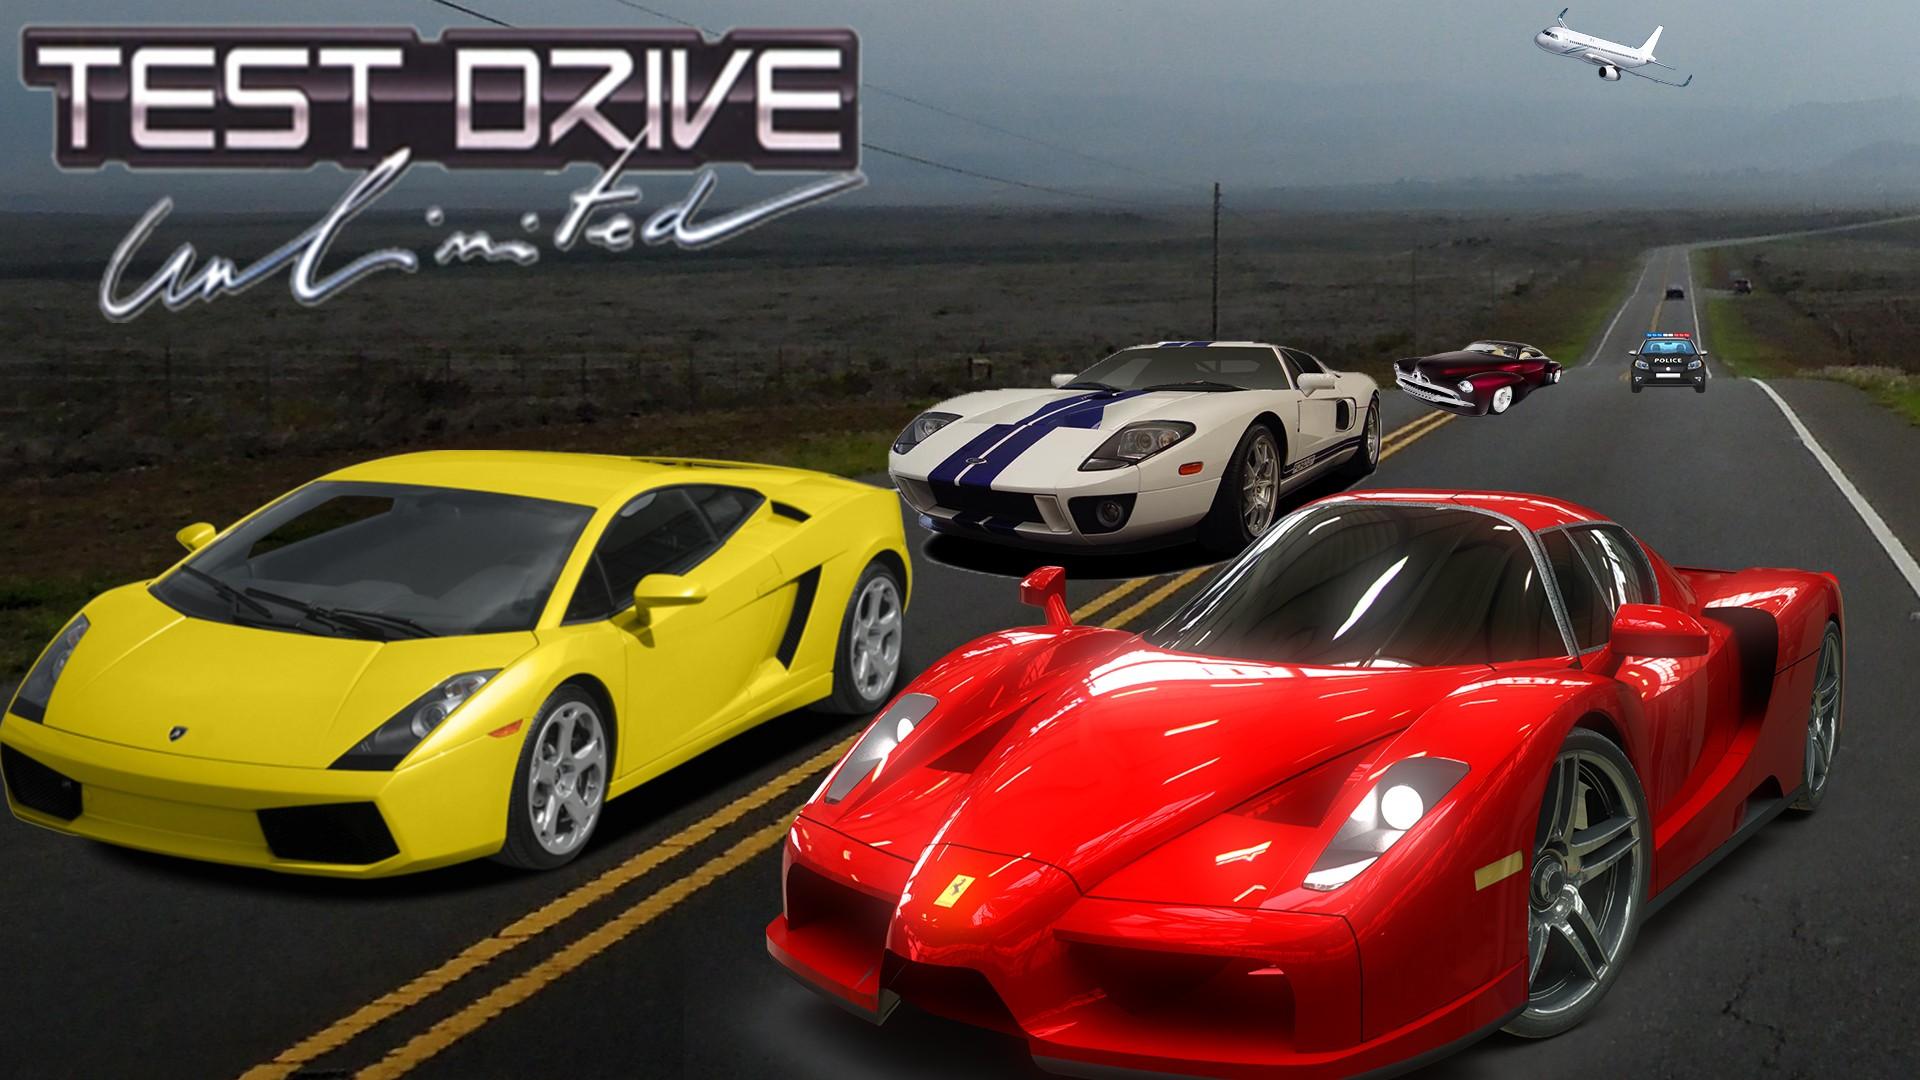 Test Drive Unlimited vai regressar em breve